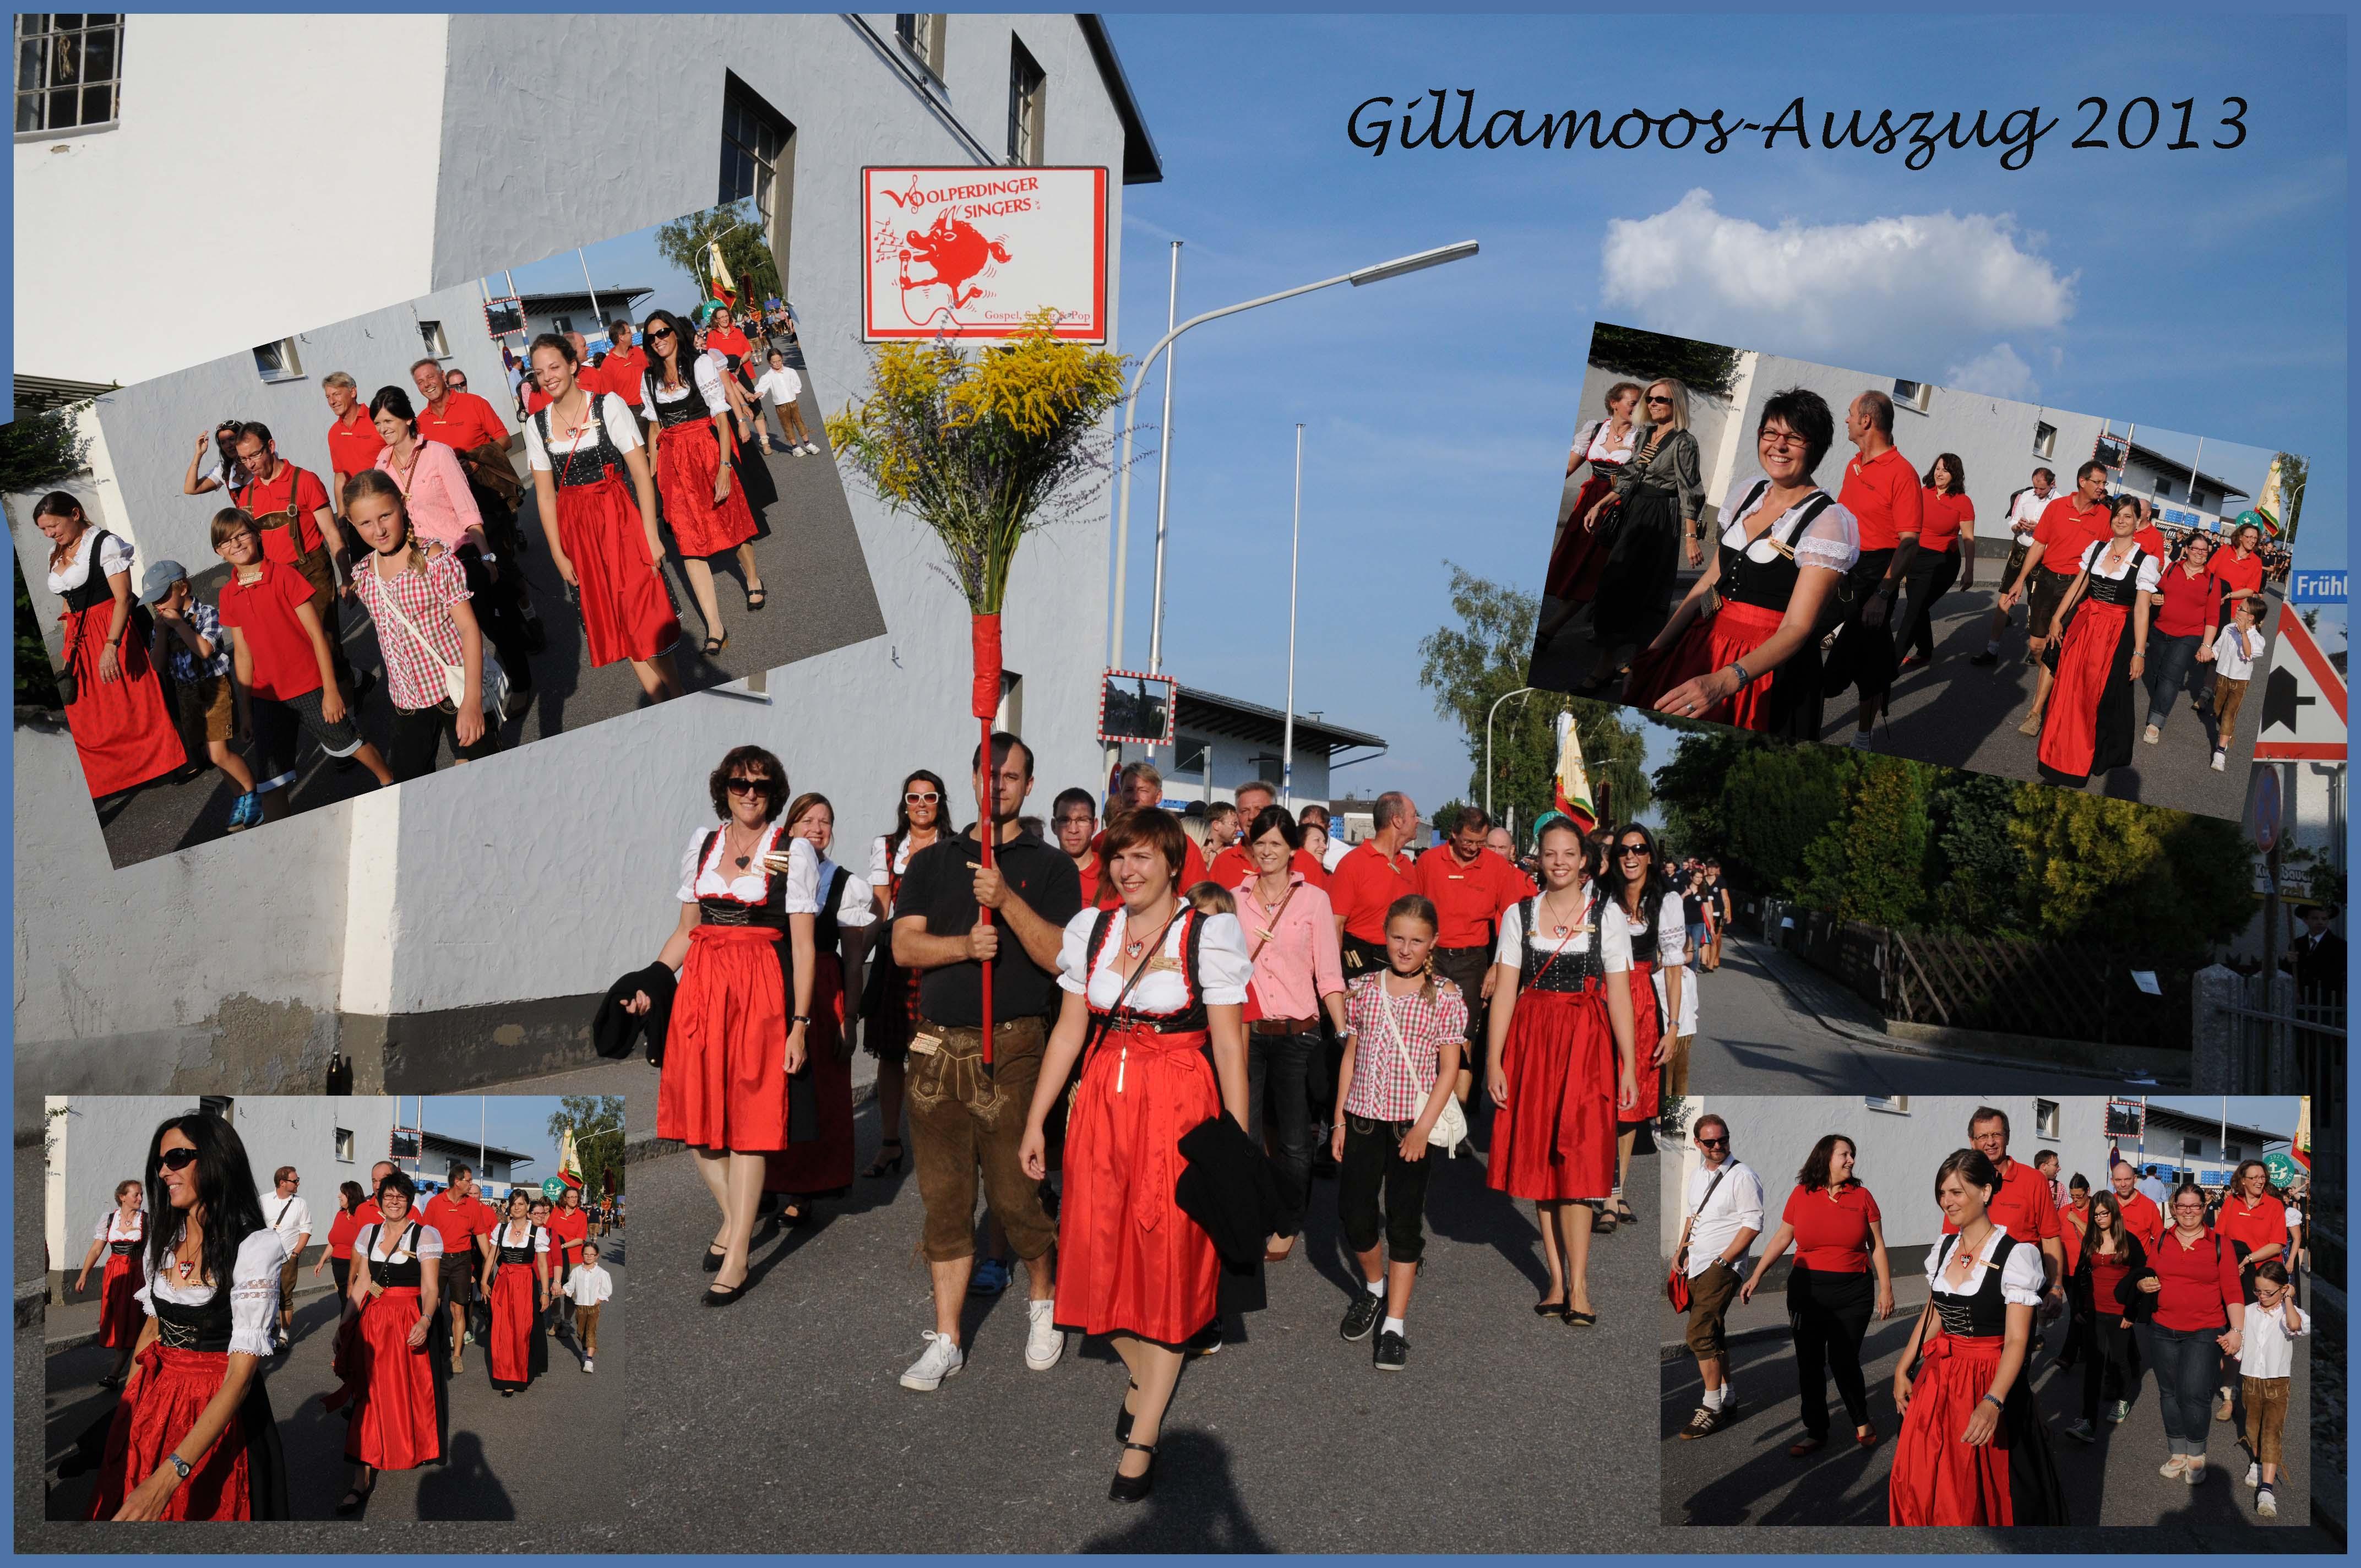 Gillamoos 2013